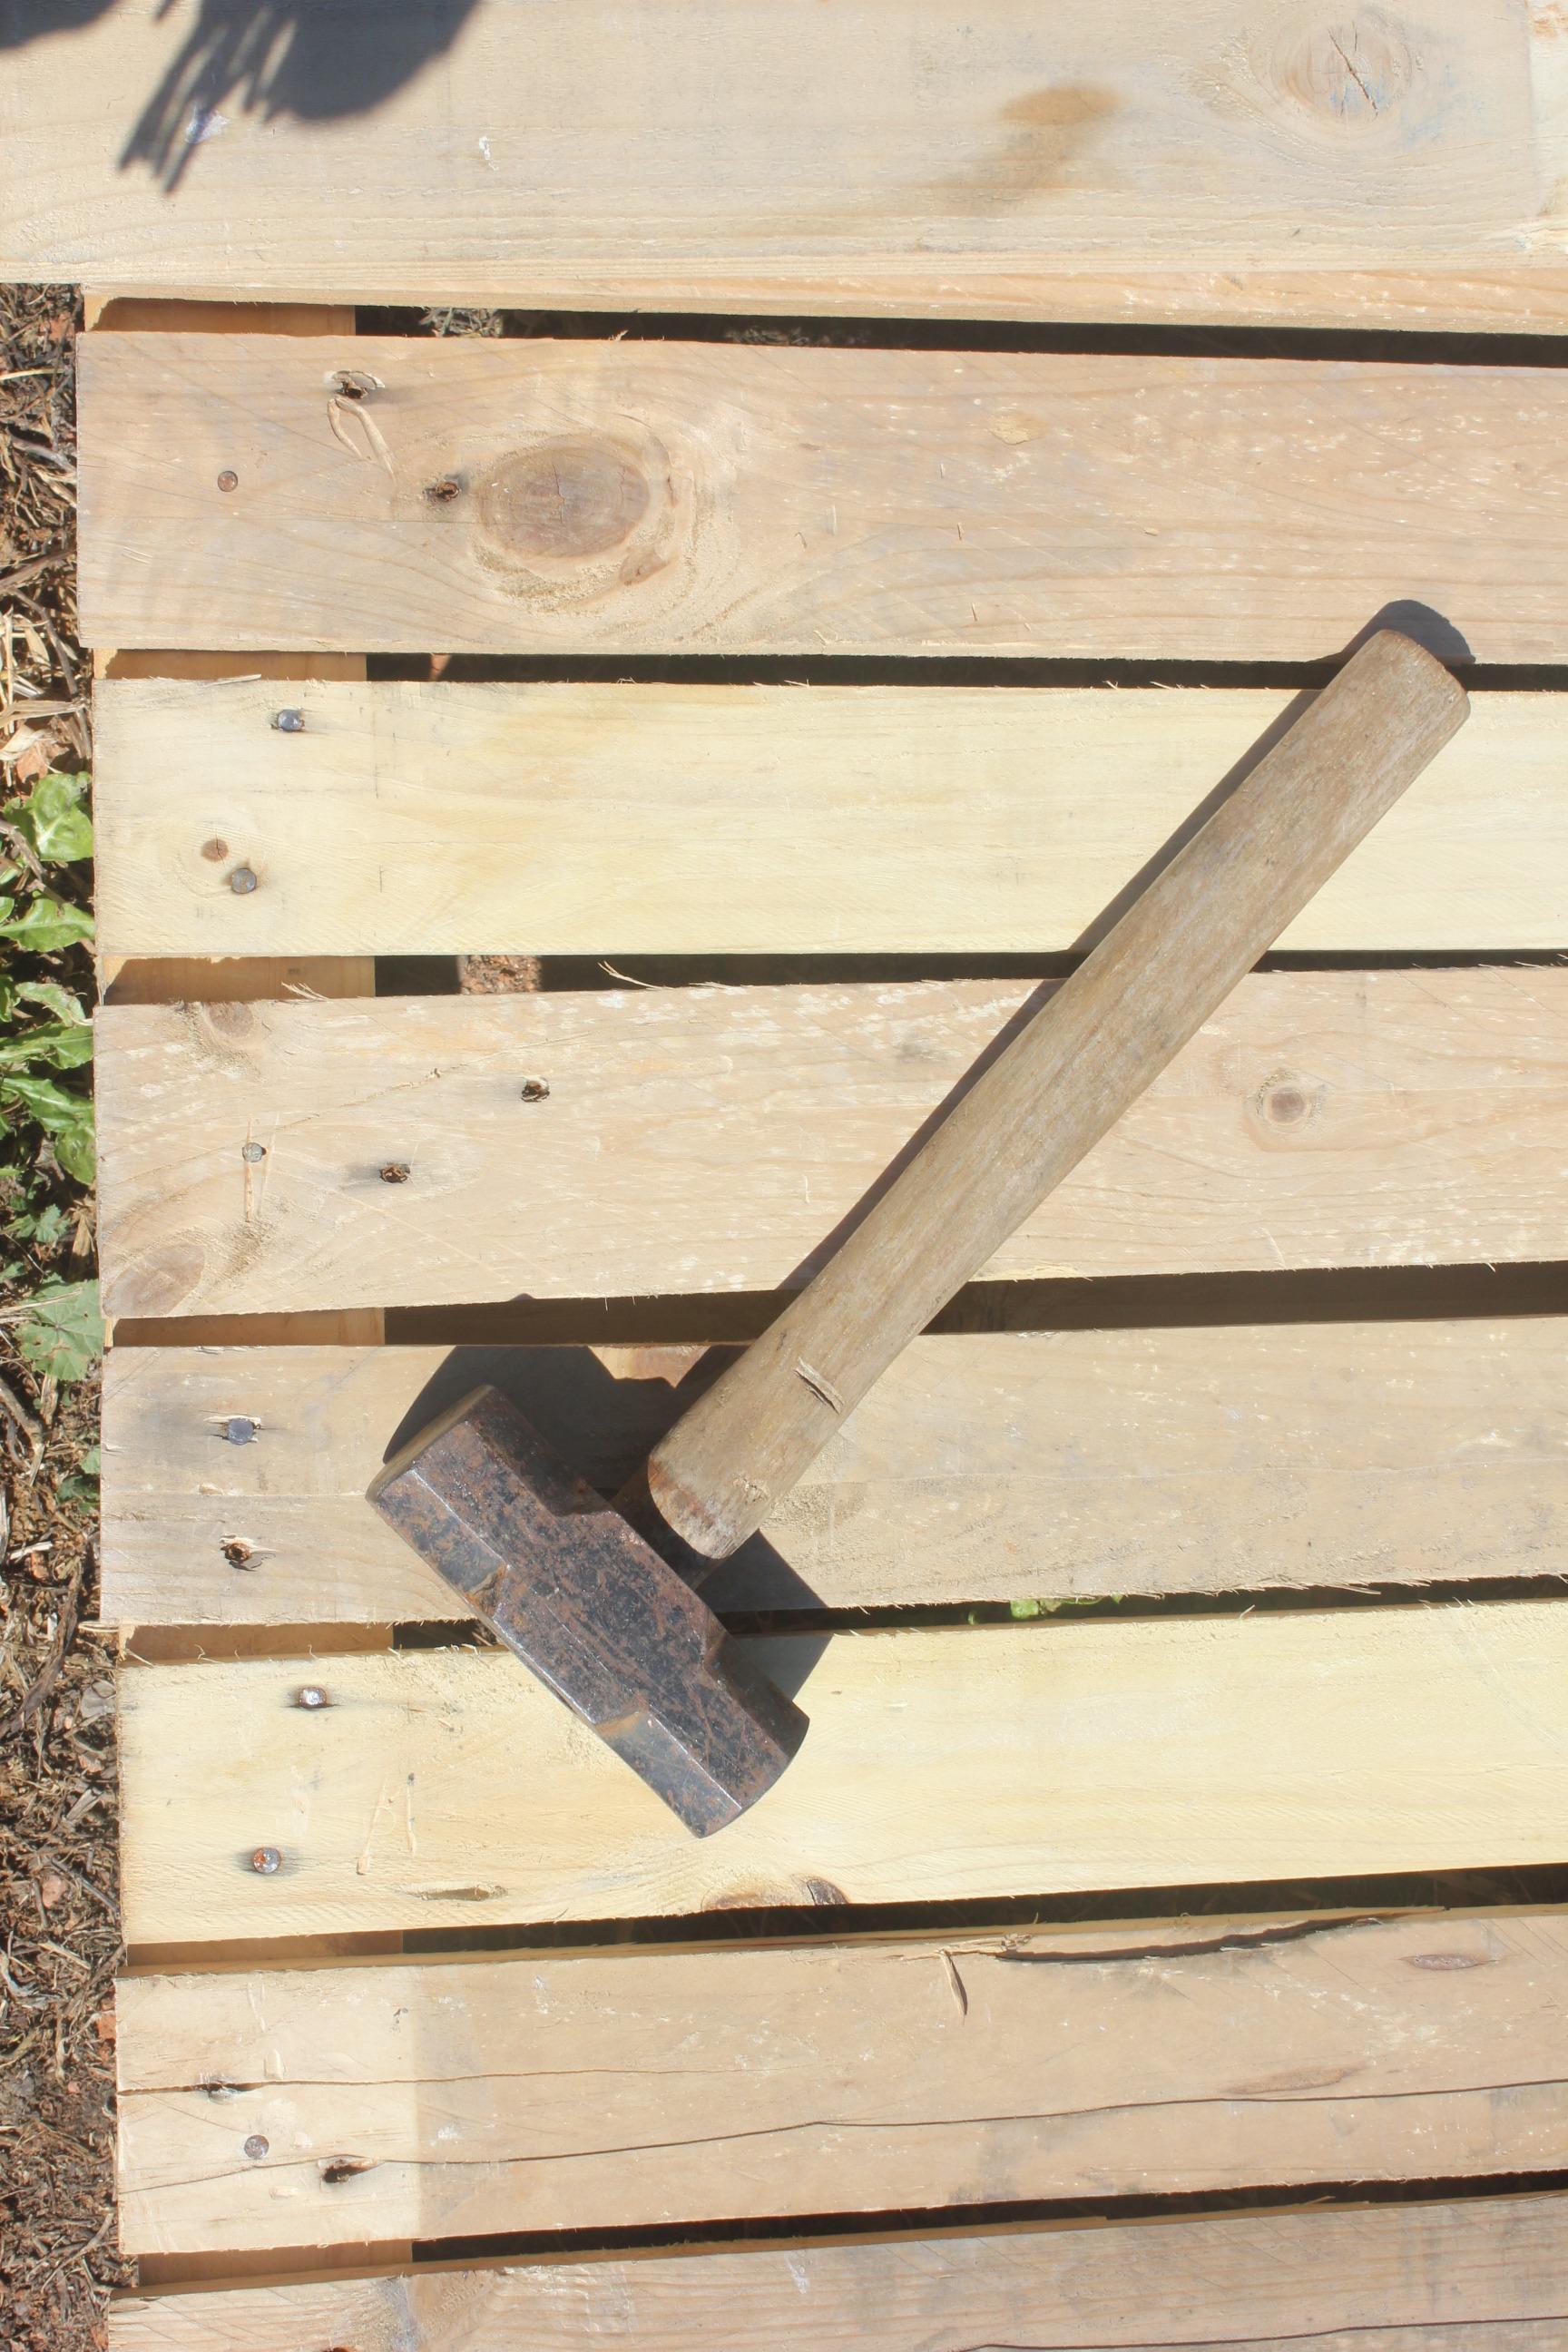 Carpintero de madera stunning antiguo garlopn de - Carpintero de madera ...